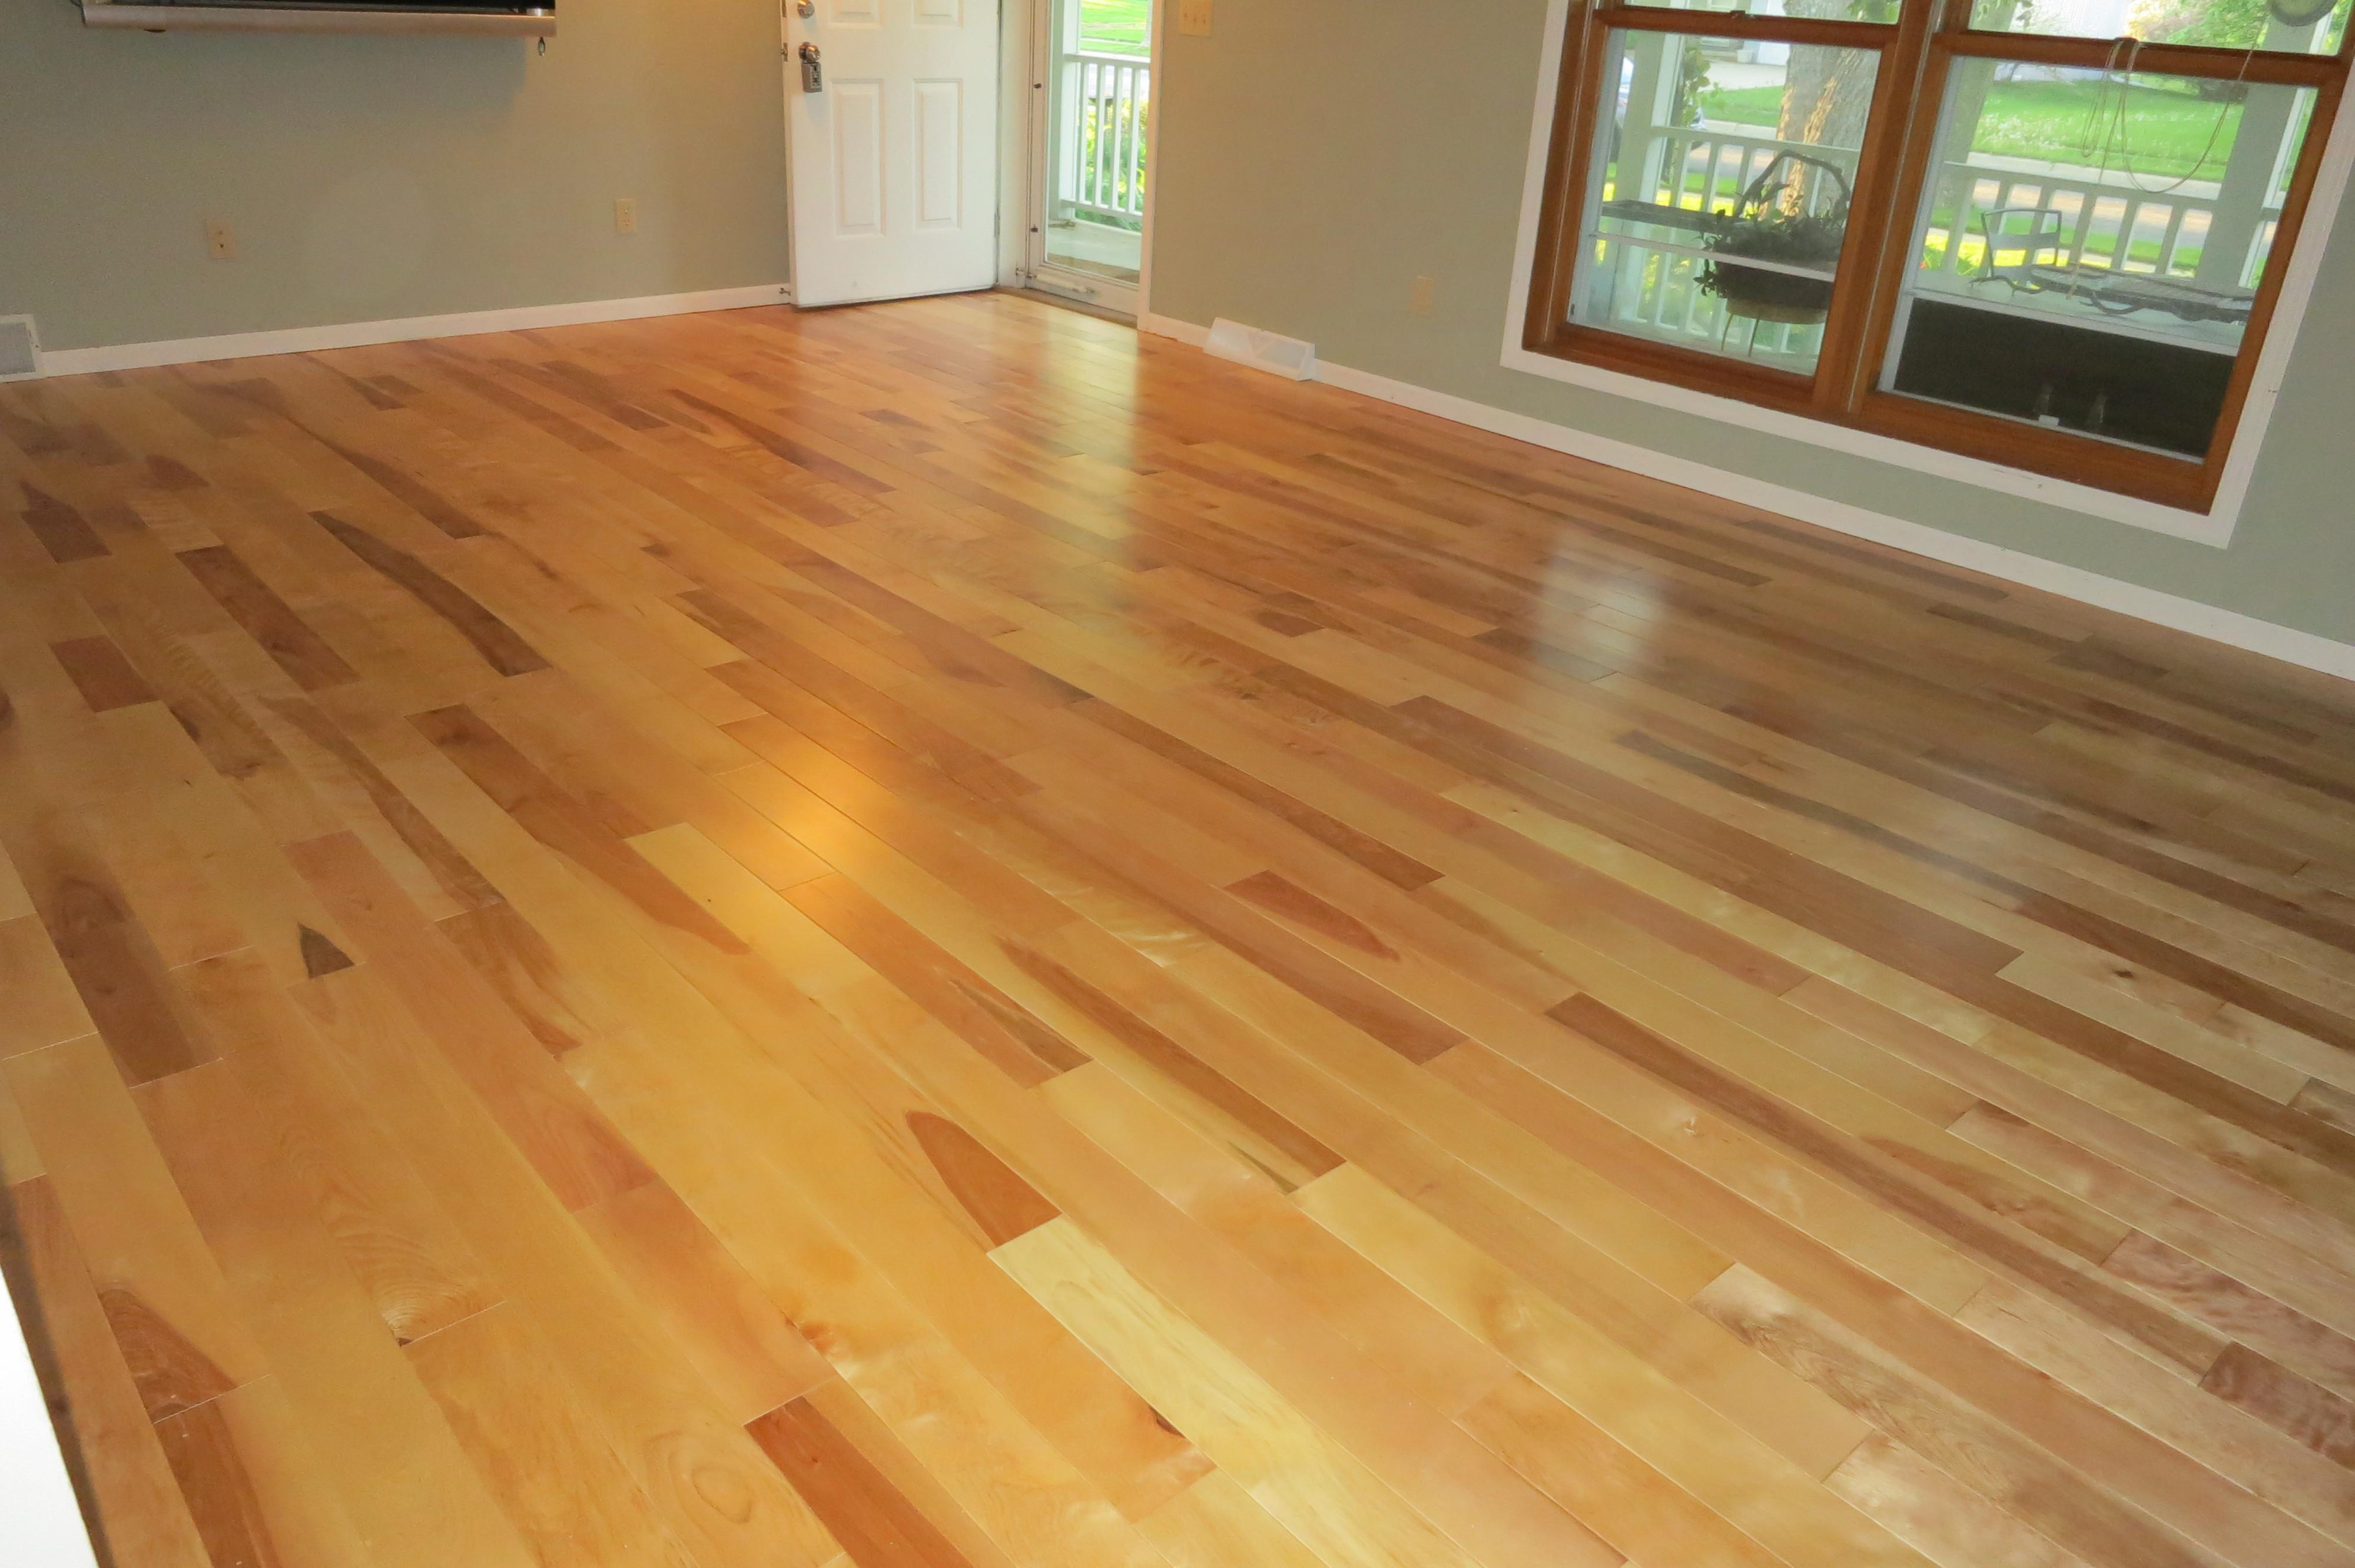 Preparing Hardwood Floors for Sanding Of Imperial Wood Floors Madison Wi Hardwood Floors Hardwood Floor Regarding Home A